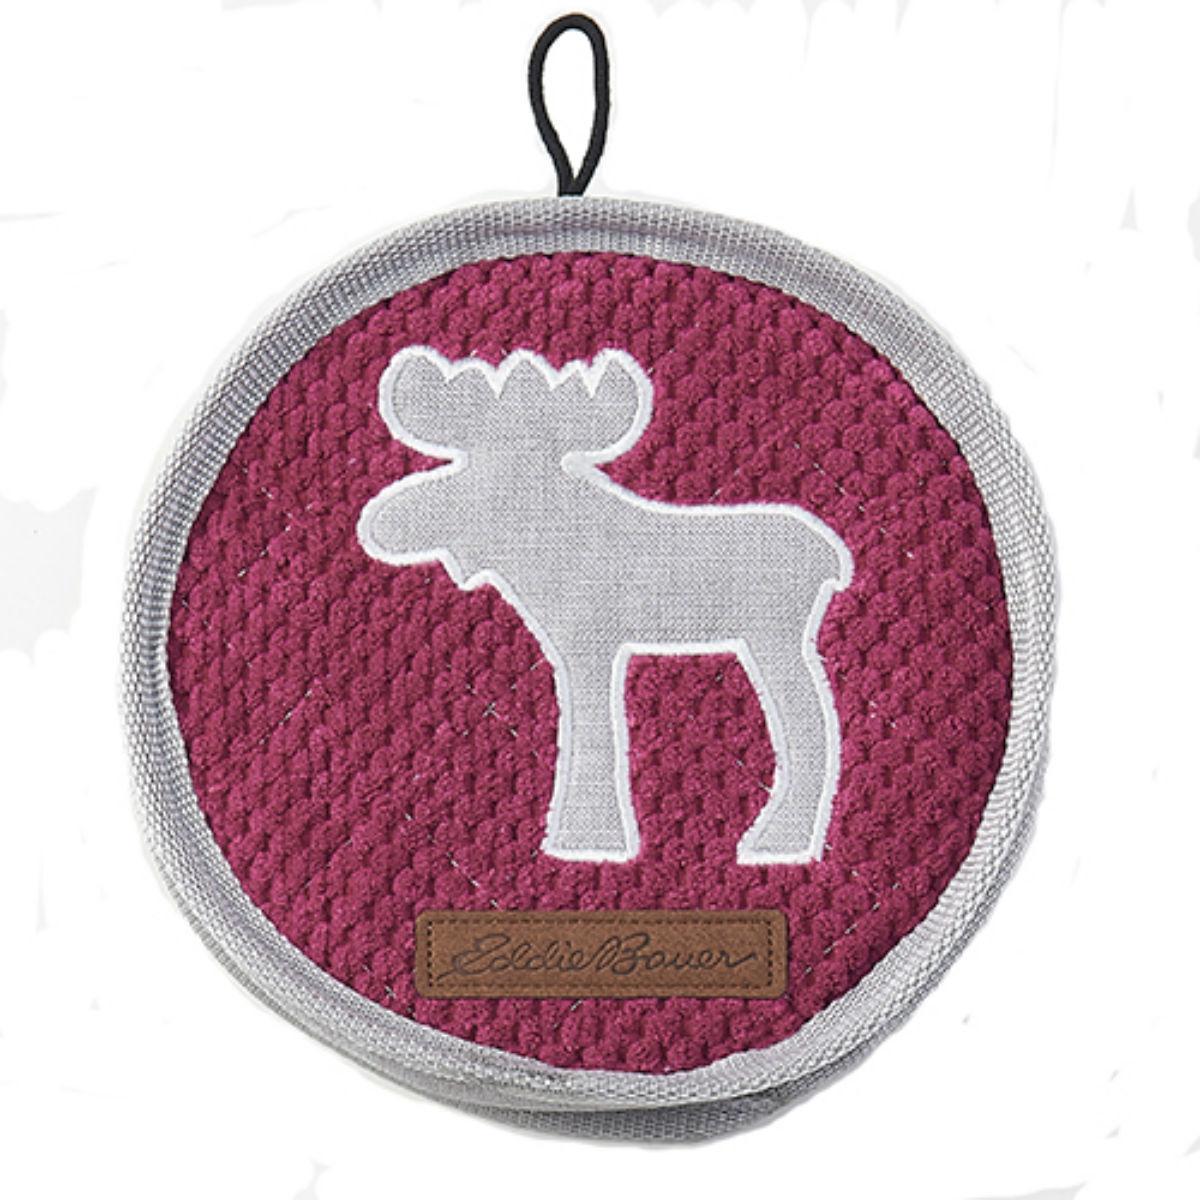 Eddie Bauer Moose Disc Dog Toy - Raspberry